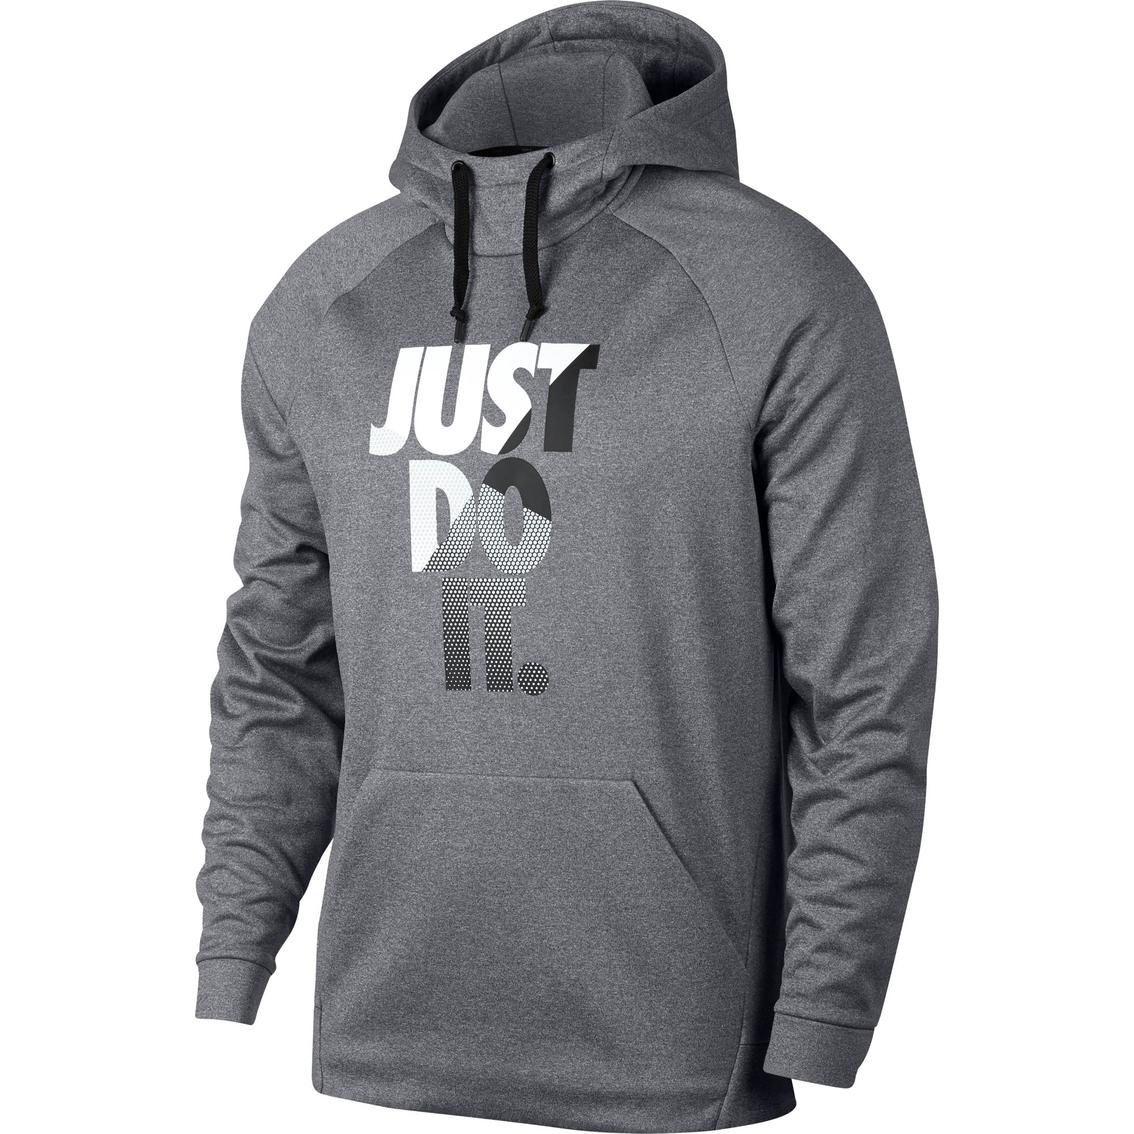 Nike Just Do It Therma Training Hoodie | Hoodies & Jackets ...